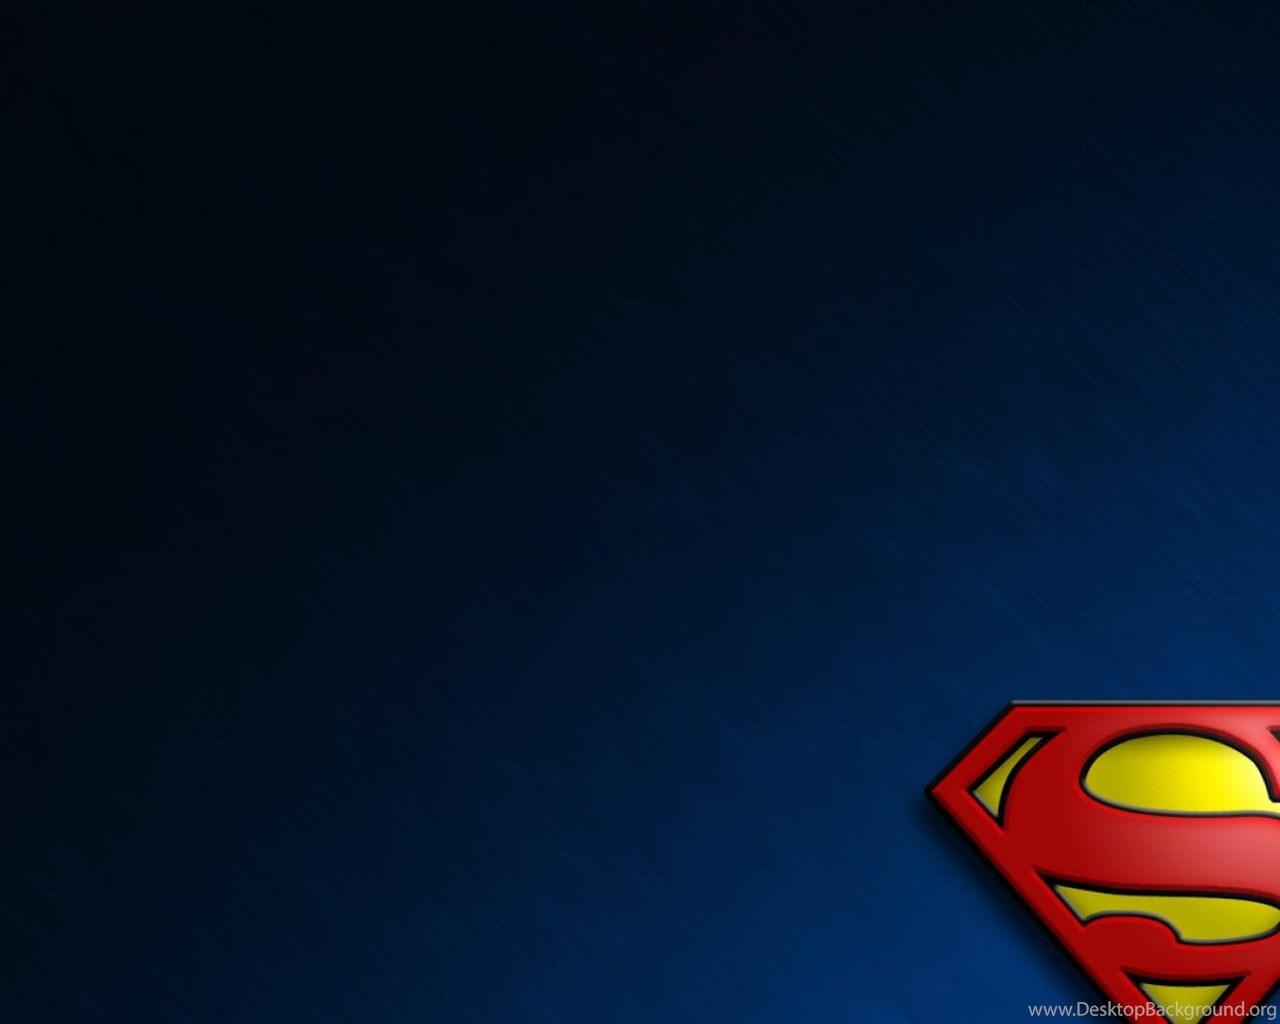 SUPERMAN SYMBOL WALLPAPER Desktop Background